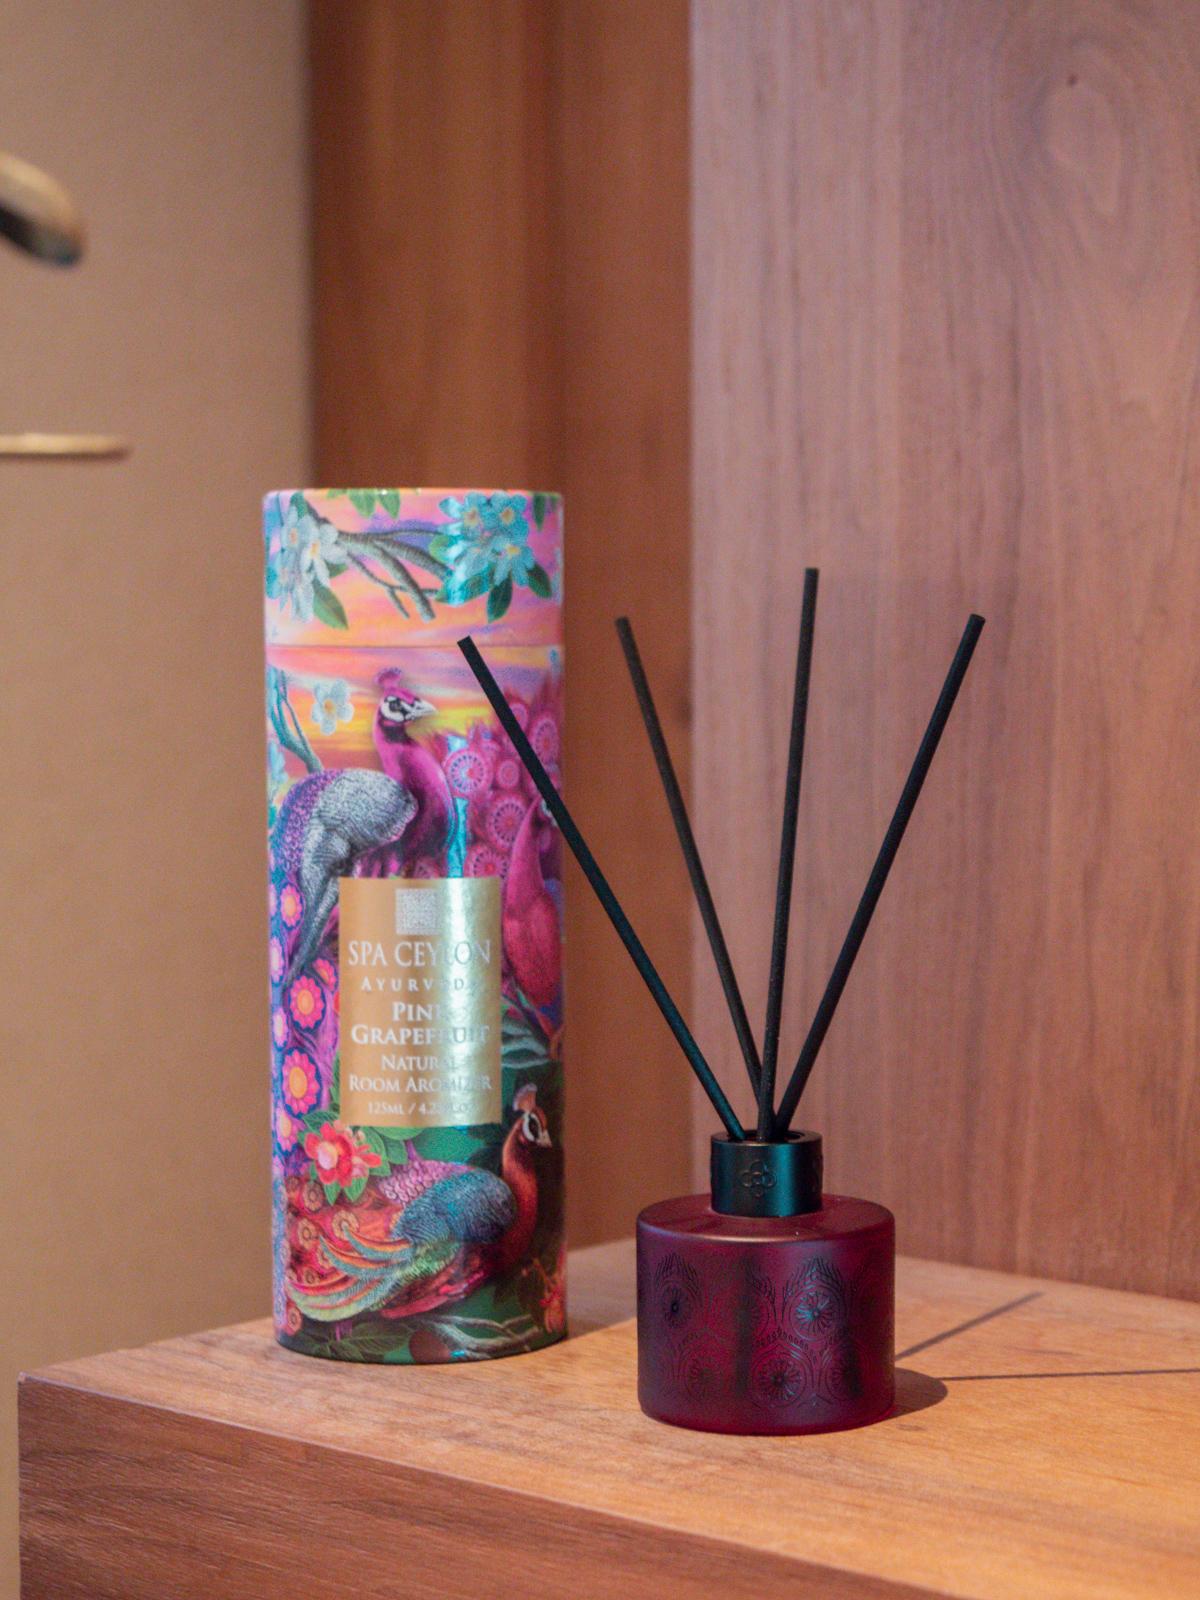 Spa Ceylon 生活香氛推薦 斯里蘭卡皇室御用 東方神秘奢華香調